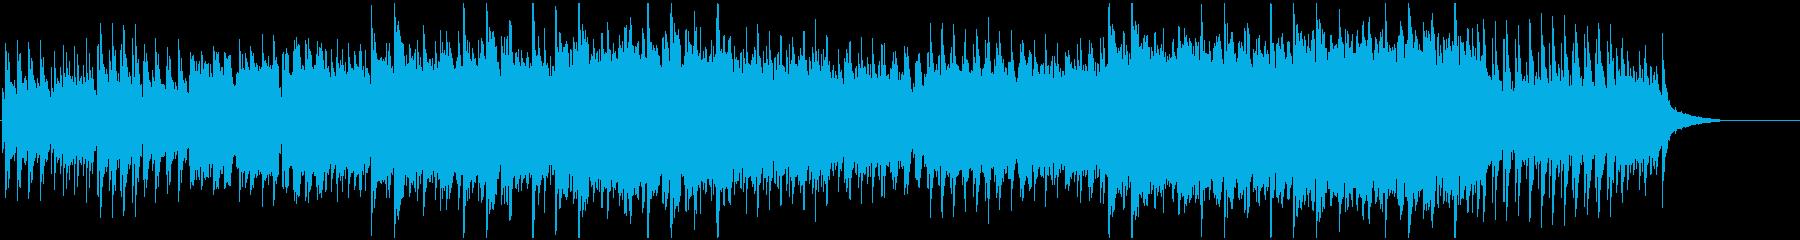 HOPEFUL RAIN's reproduced waveform